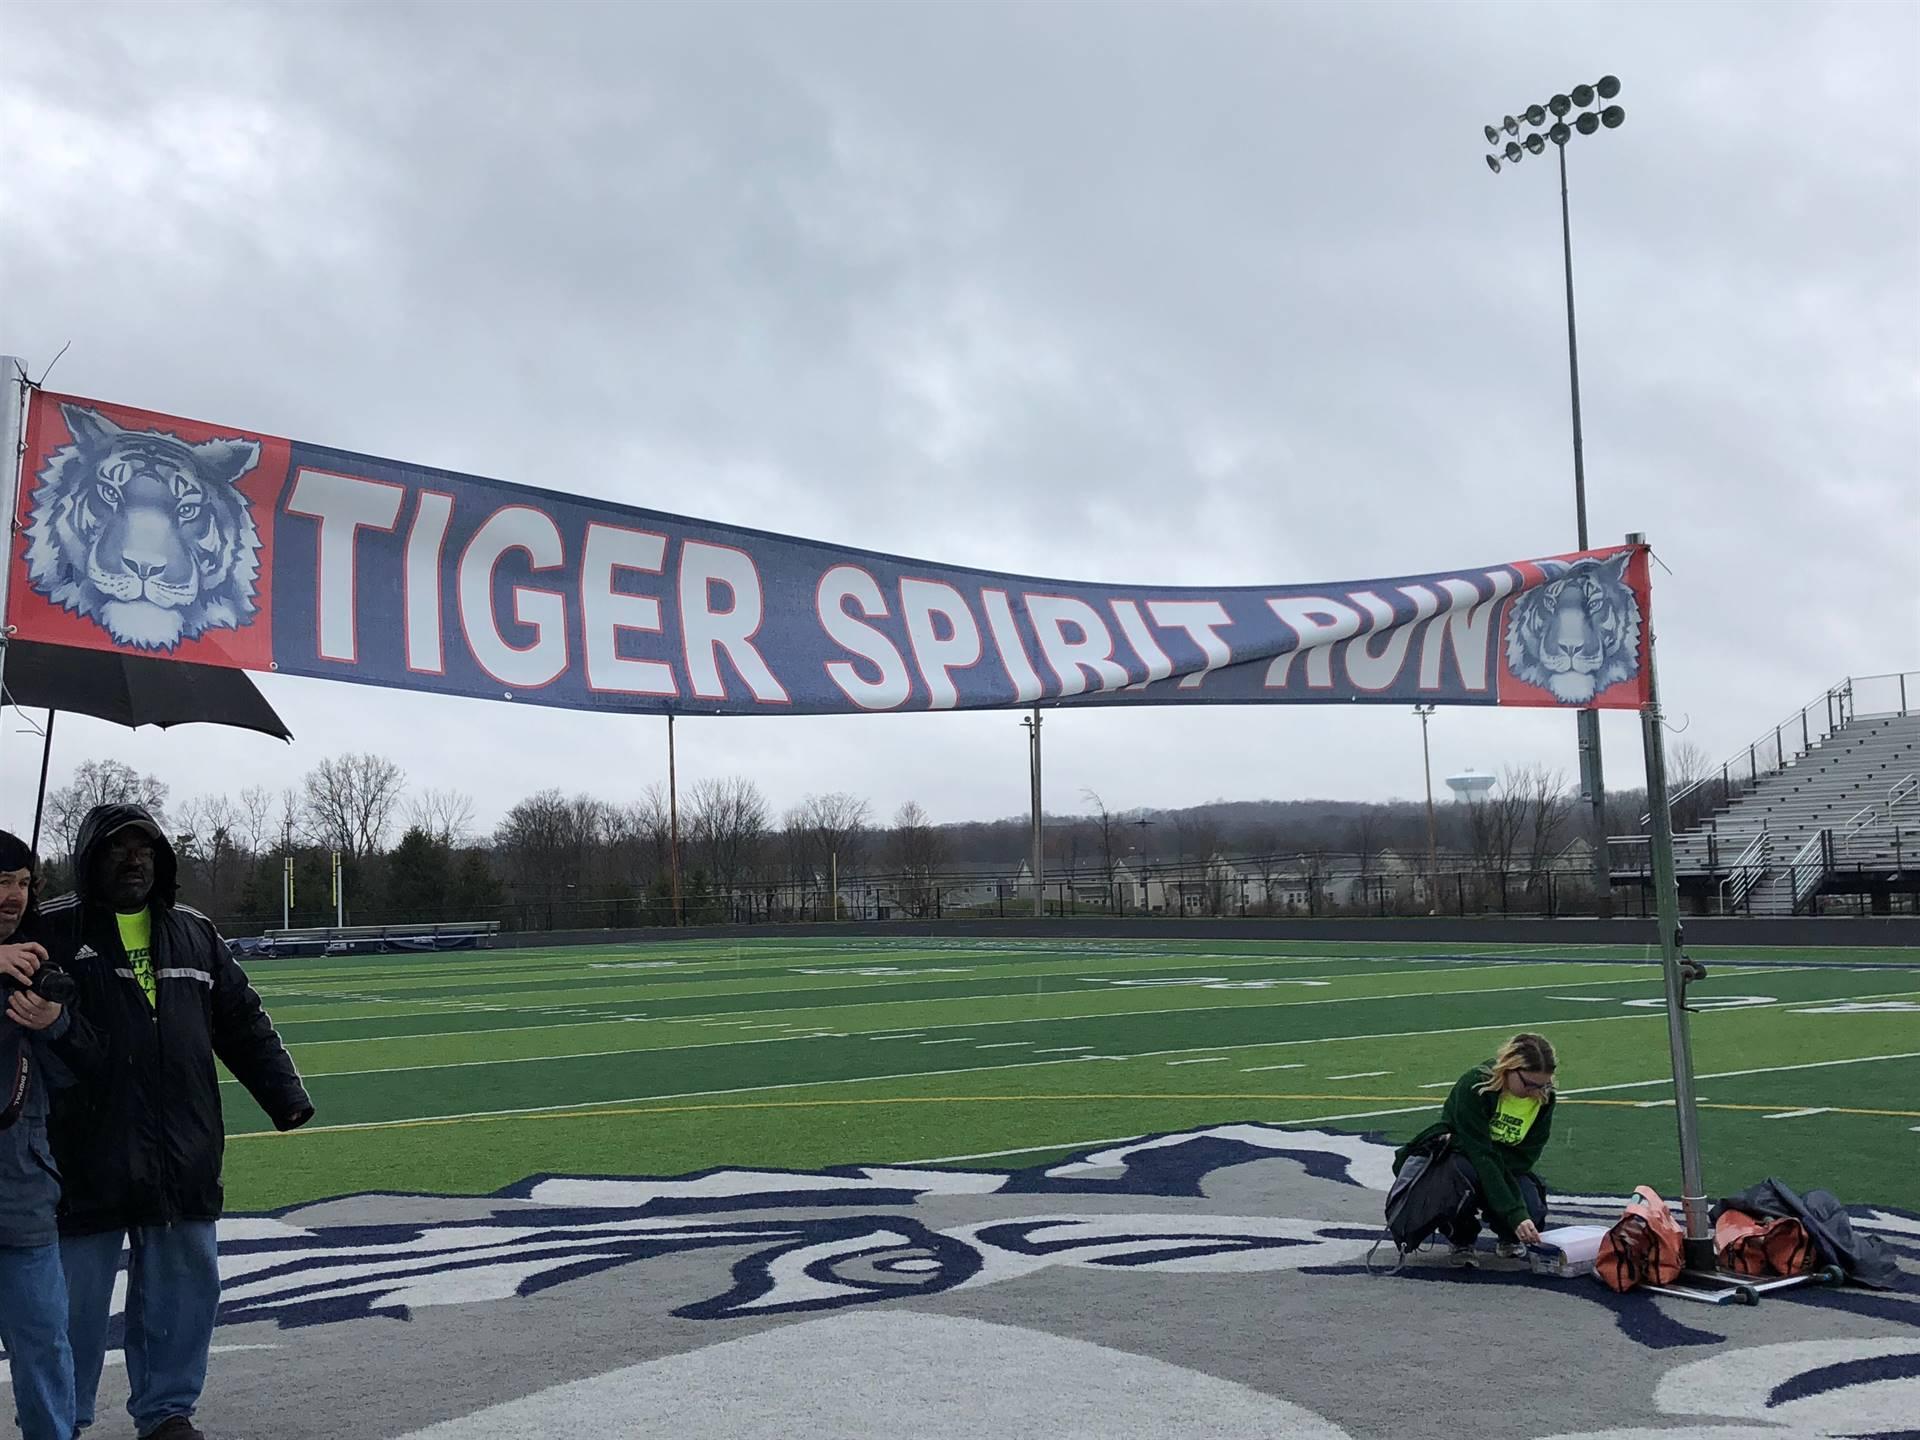 2018 Tiger Spirit Run